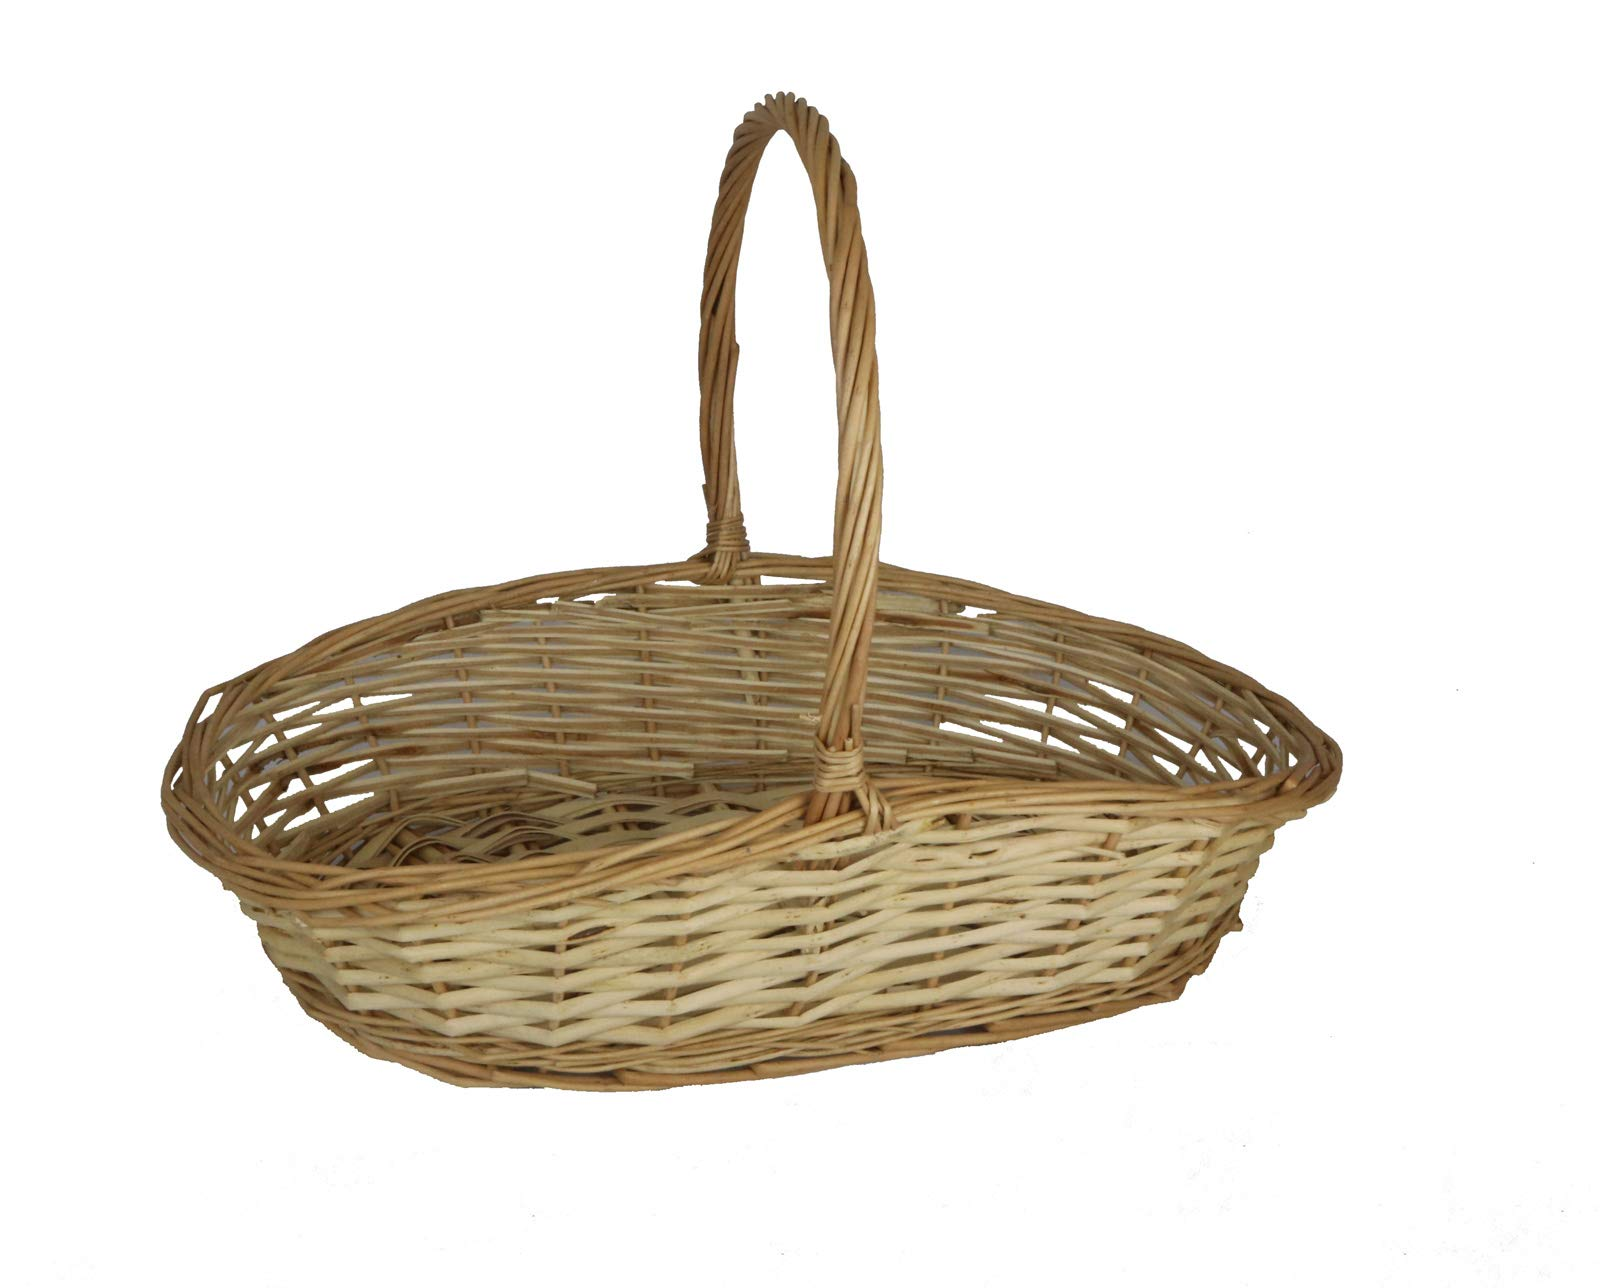 Garden Winds Wicker Willow Basket